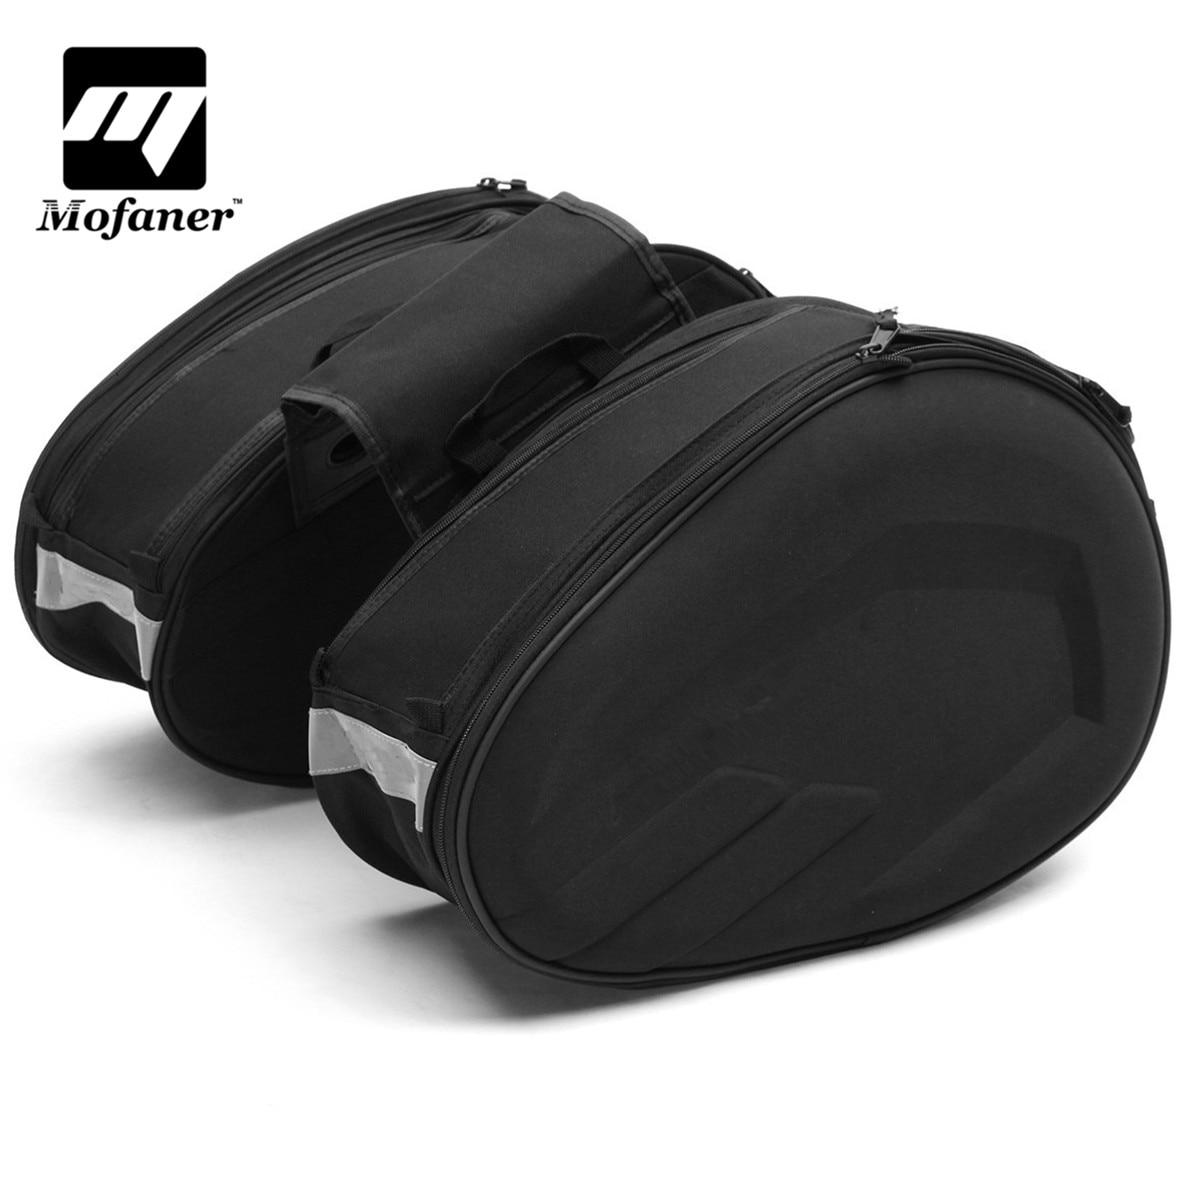 Mofaner Waterproof 58L Large Capacity Motorcycle Tool Bag Multi-use Expandable Motorbike Rear Seat Luggage Saddle Bag cube multi saddle bag